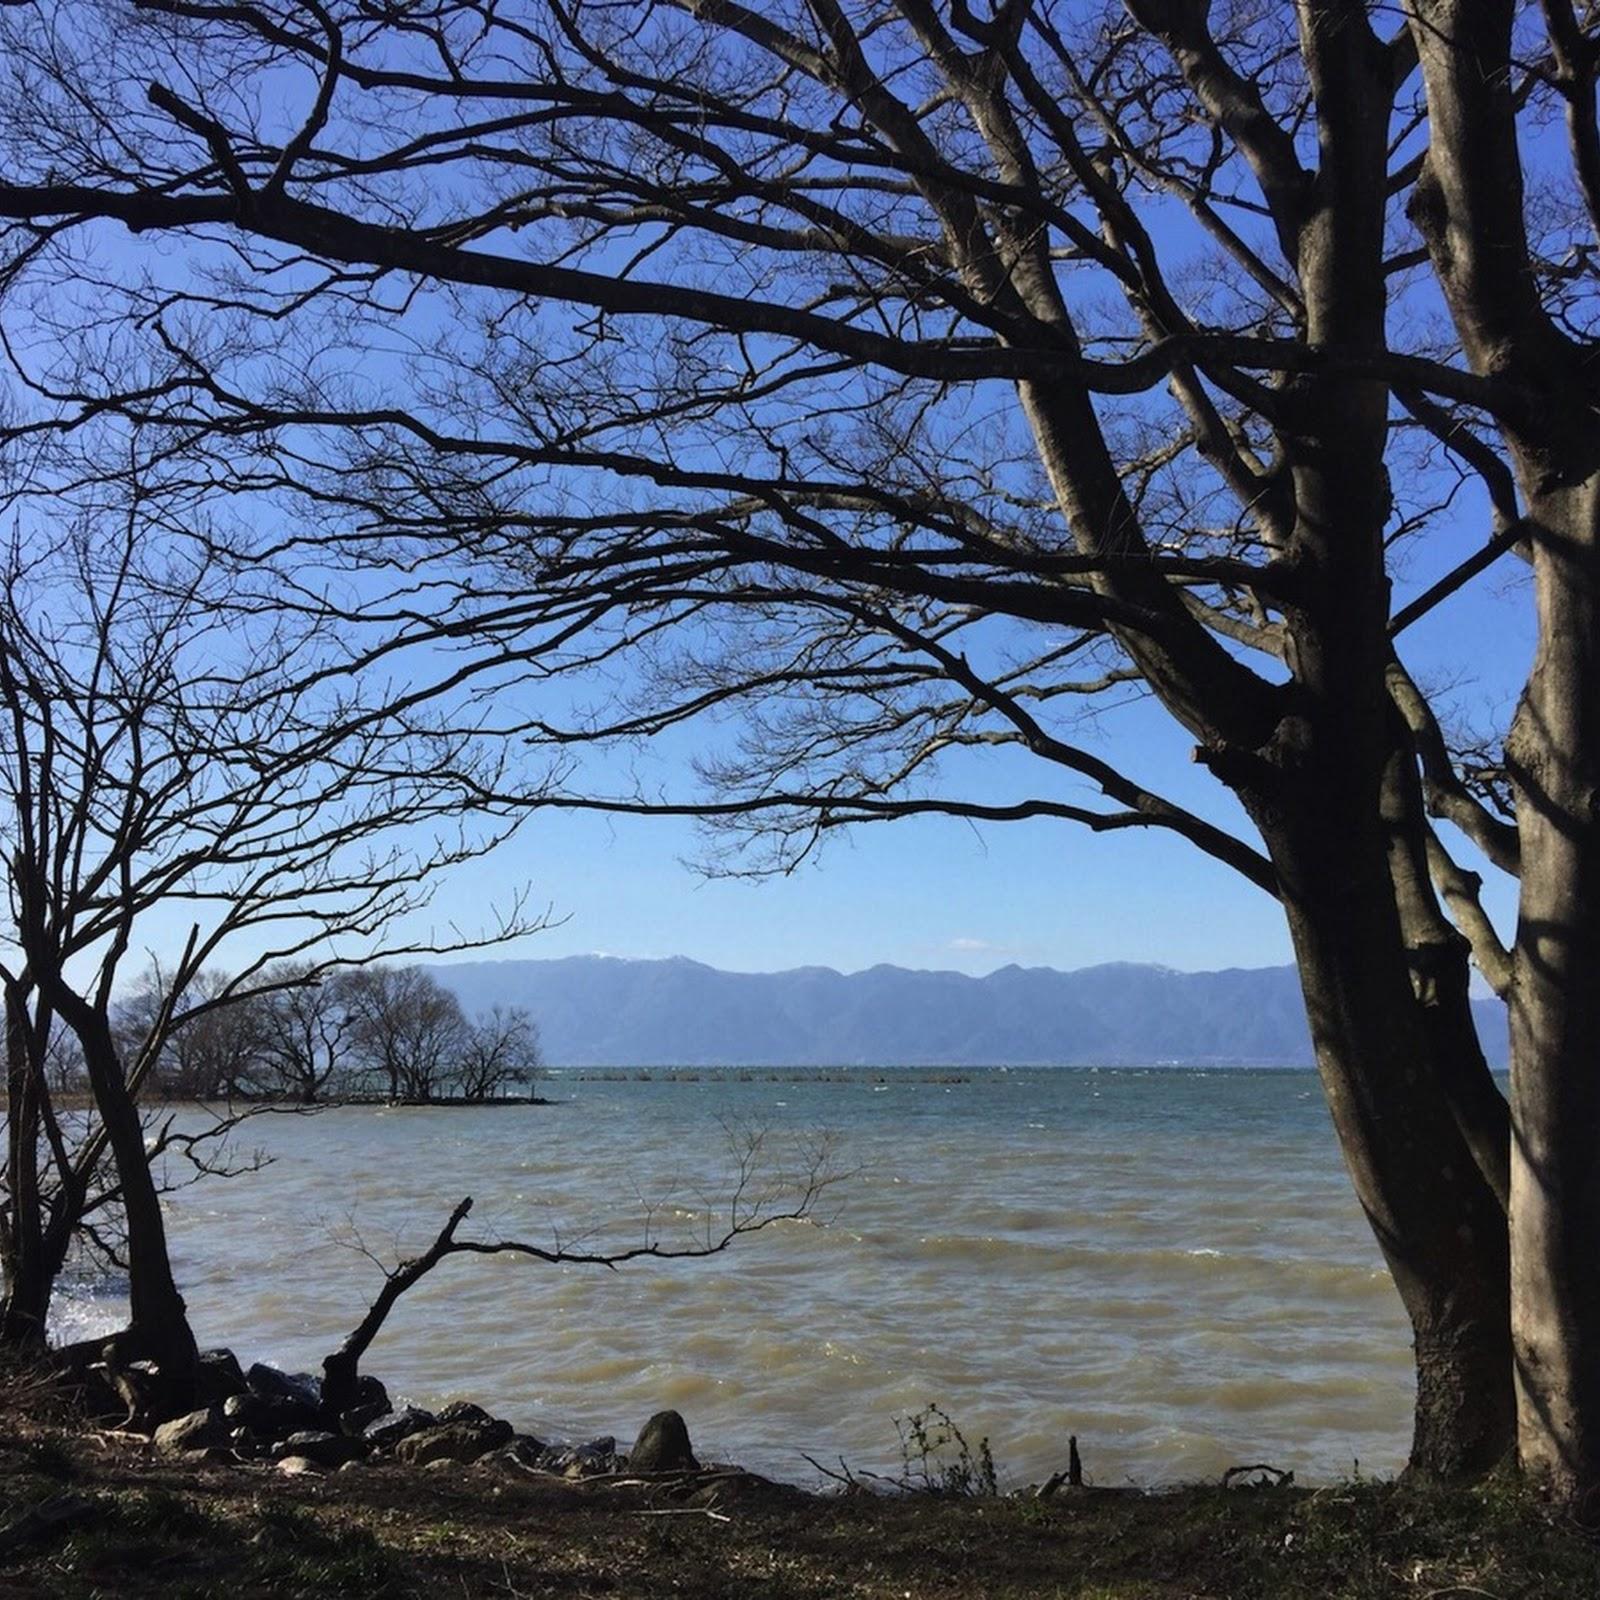 老娘遊記 2018 (06 – 16 March) @ 關西 Day 5(4)– 極on9的琵琶湖畔